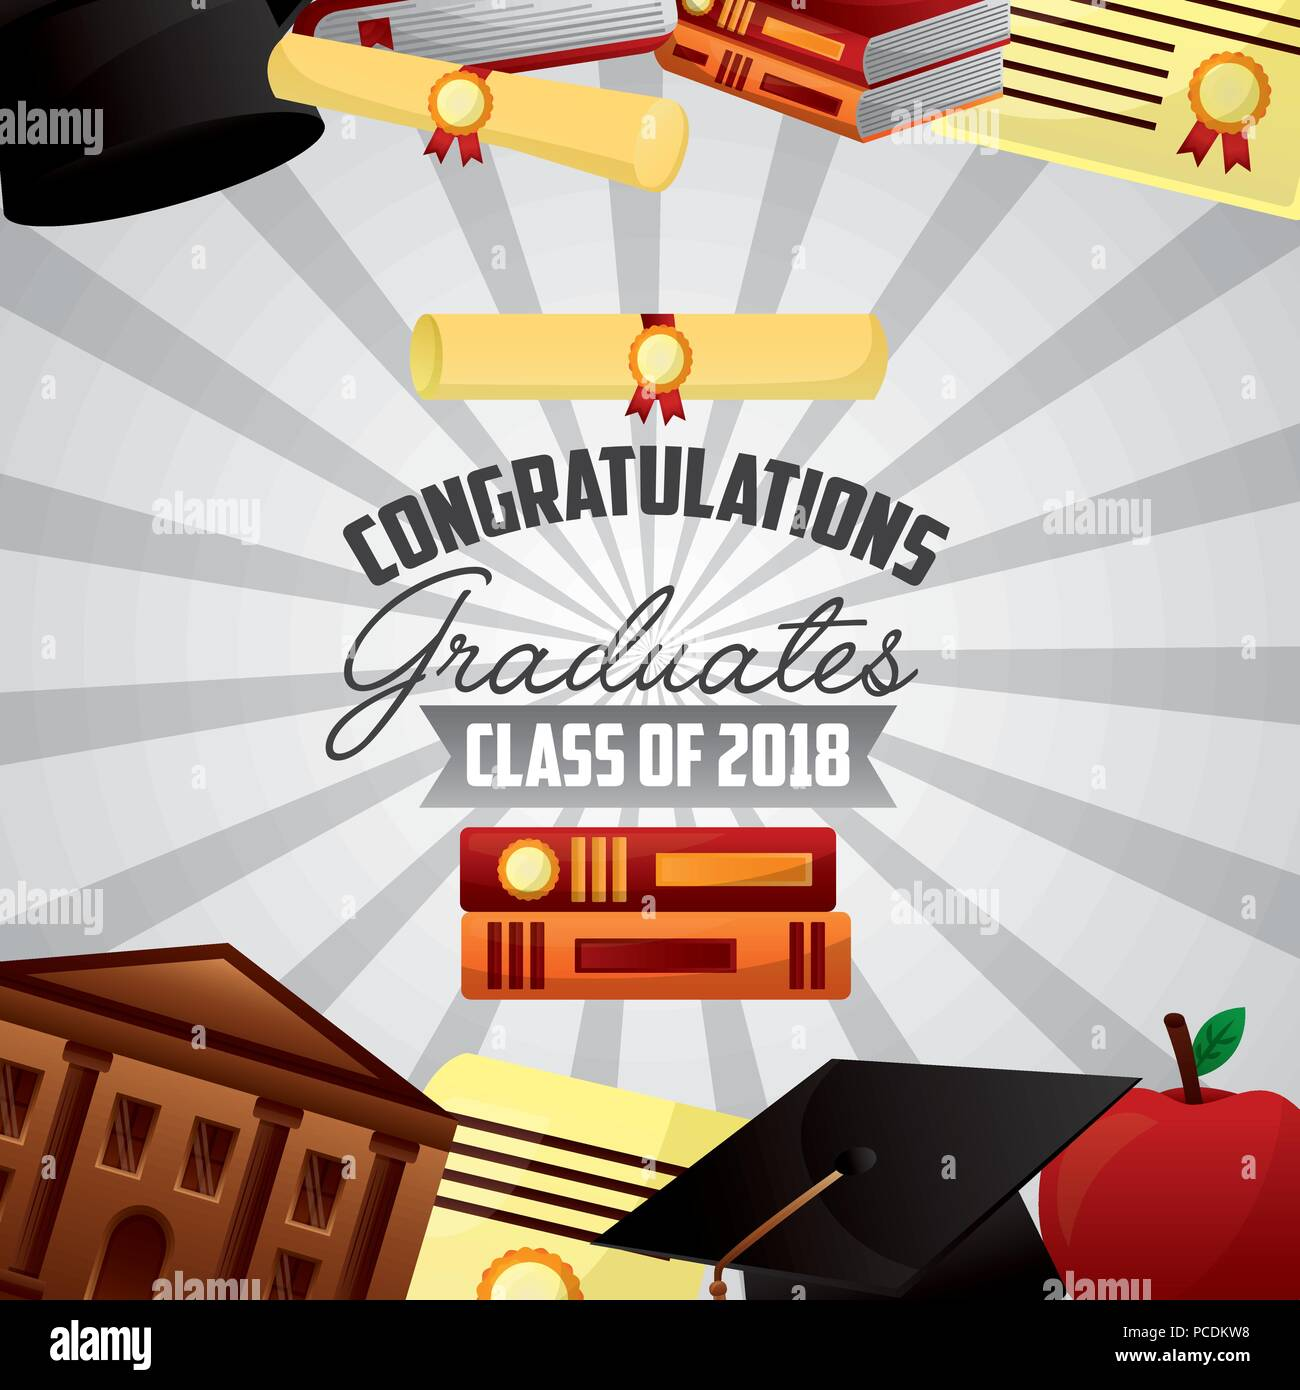 Class 2018 Congratulations Graduate Typography Stockfotos & Class ...